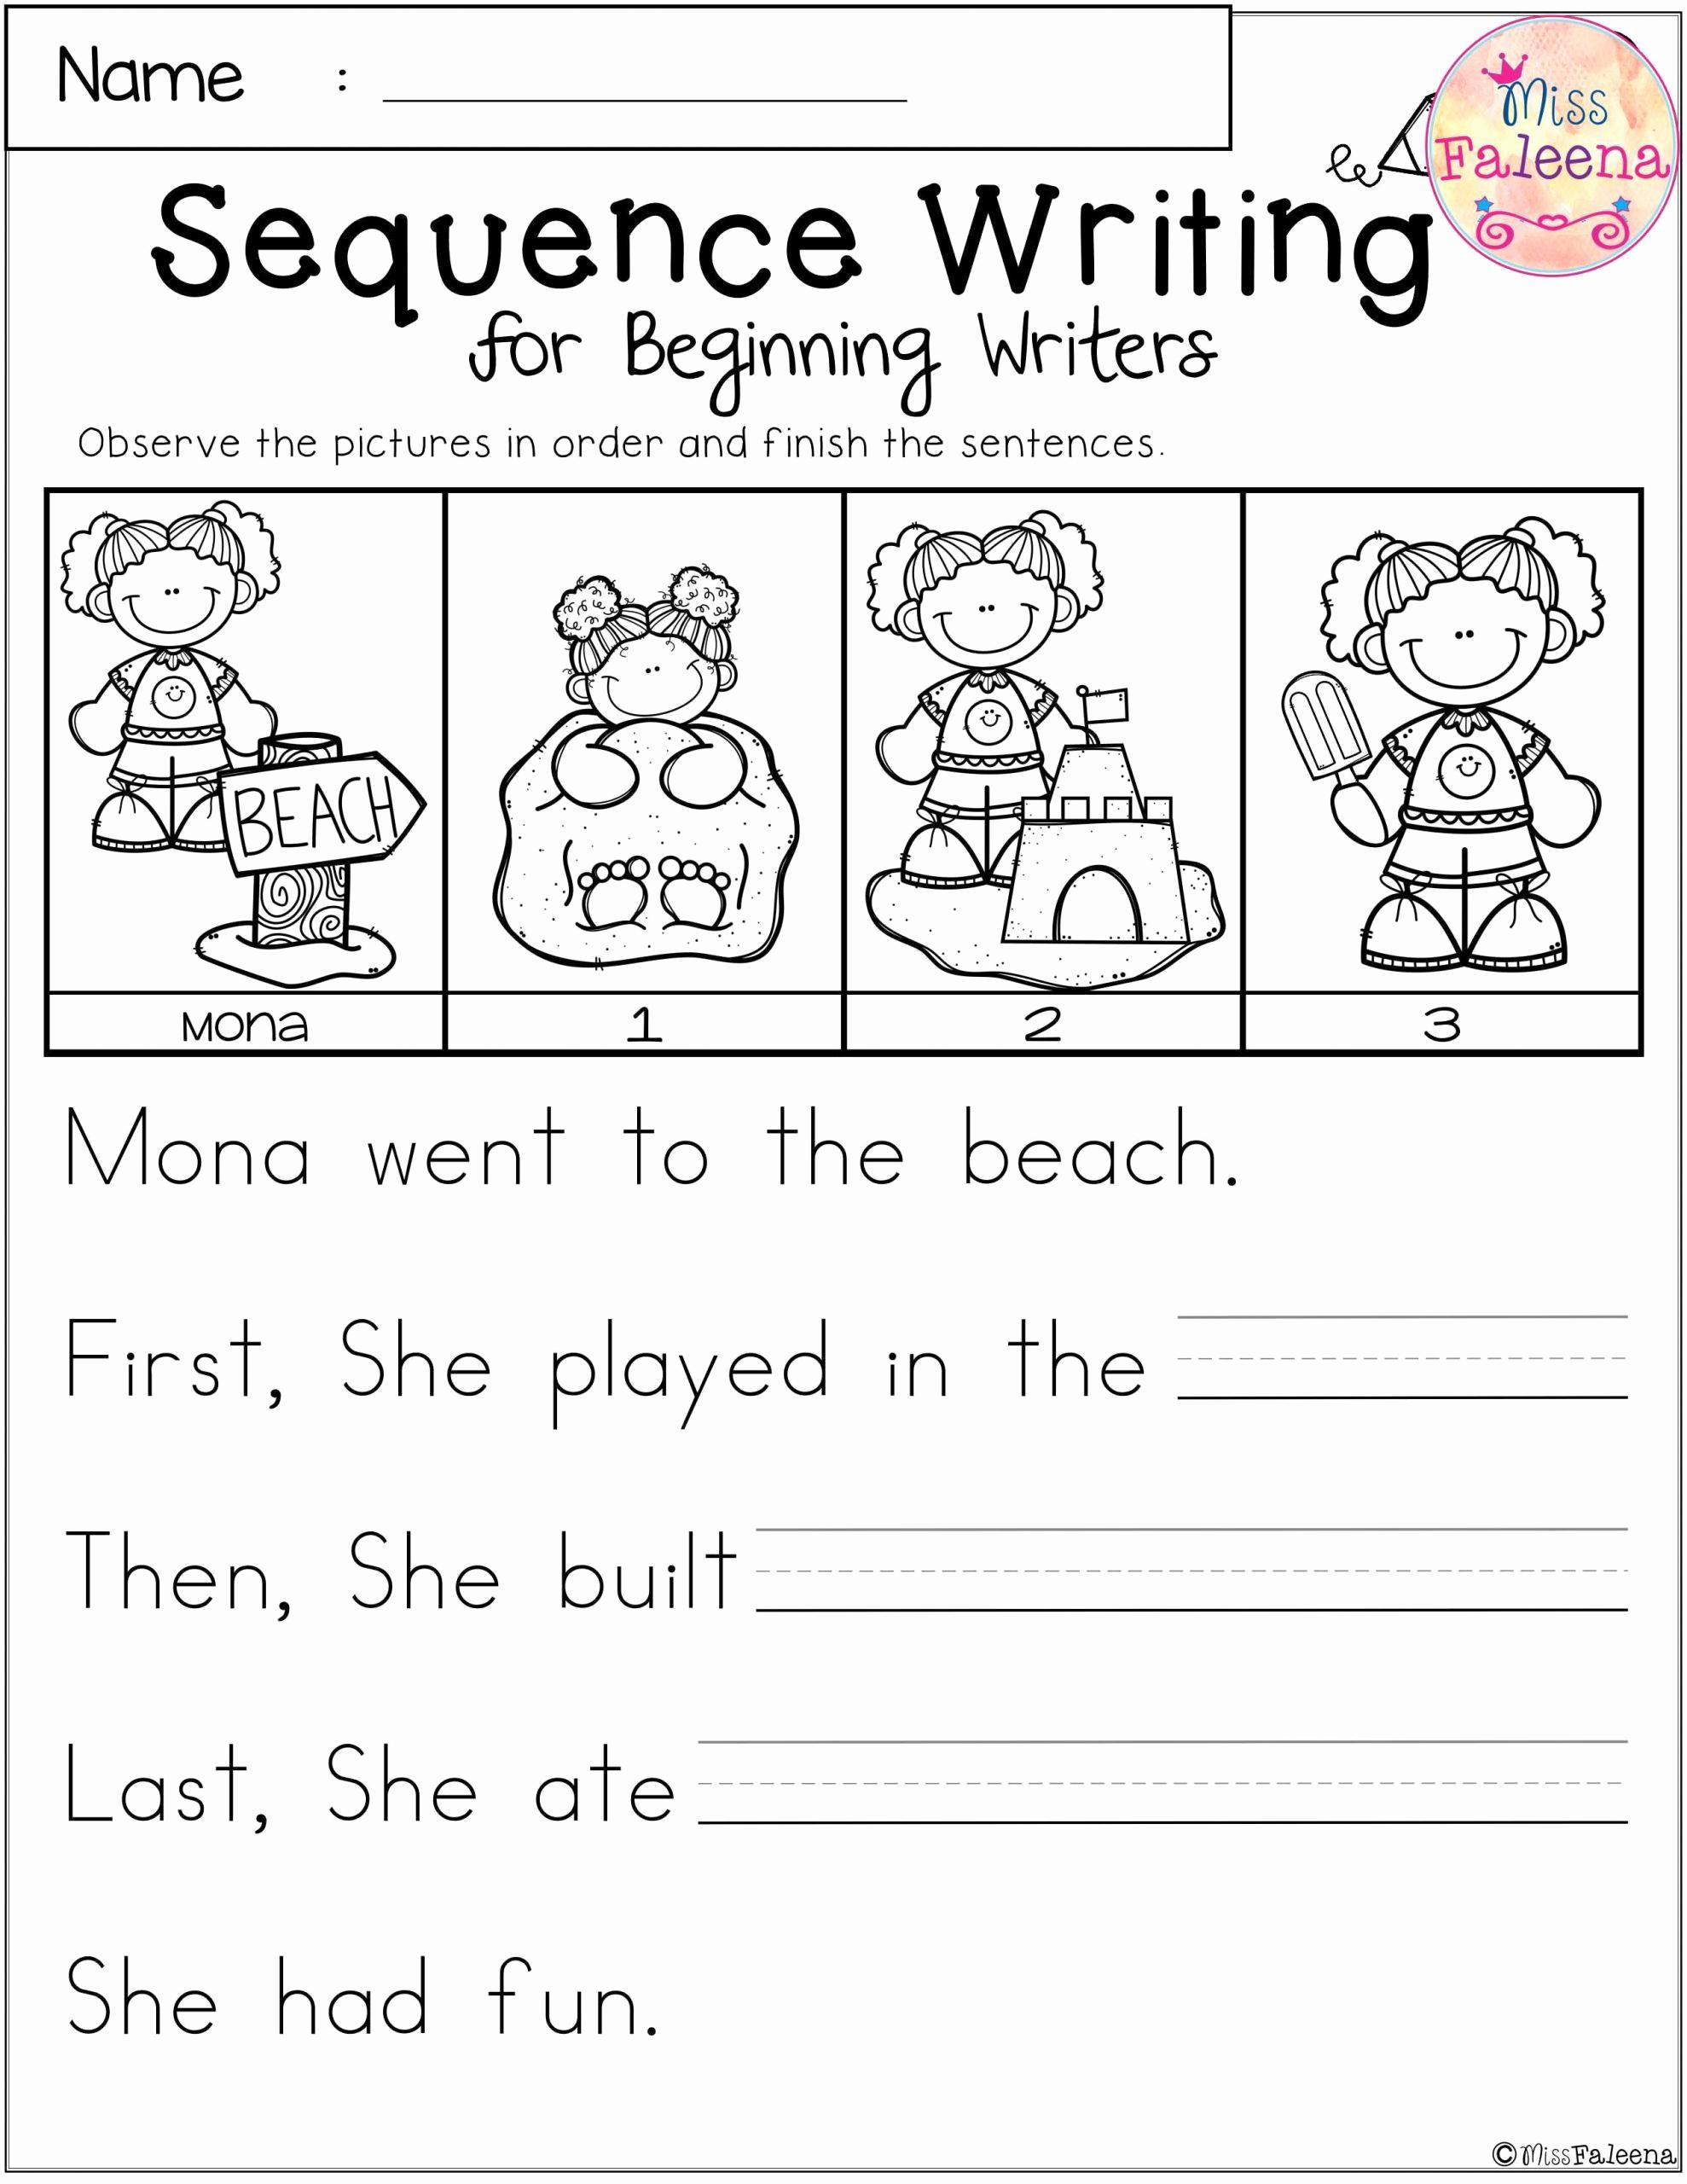 Story Sequencing Worksheets for Kindergarten Best Of 20 Sequencing Worksheet for Kindergarten